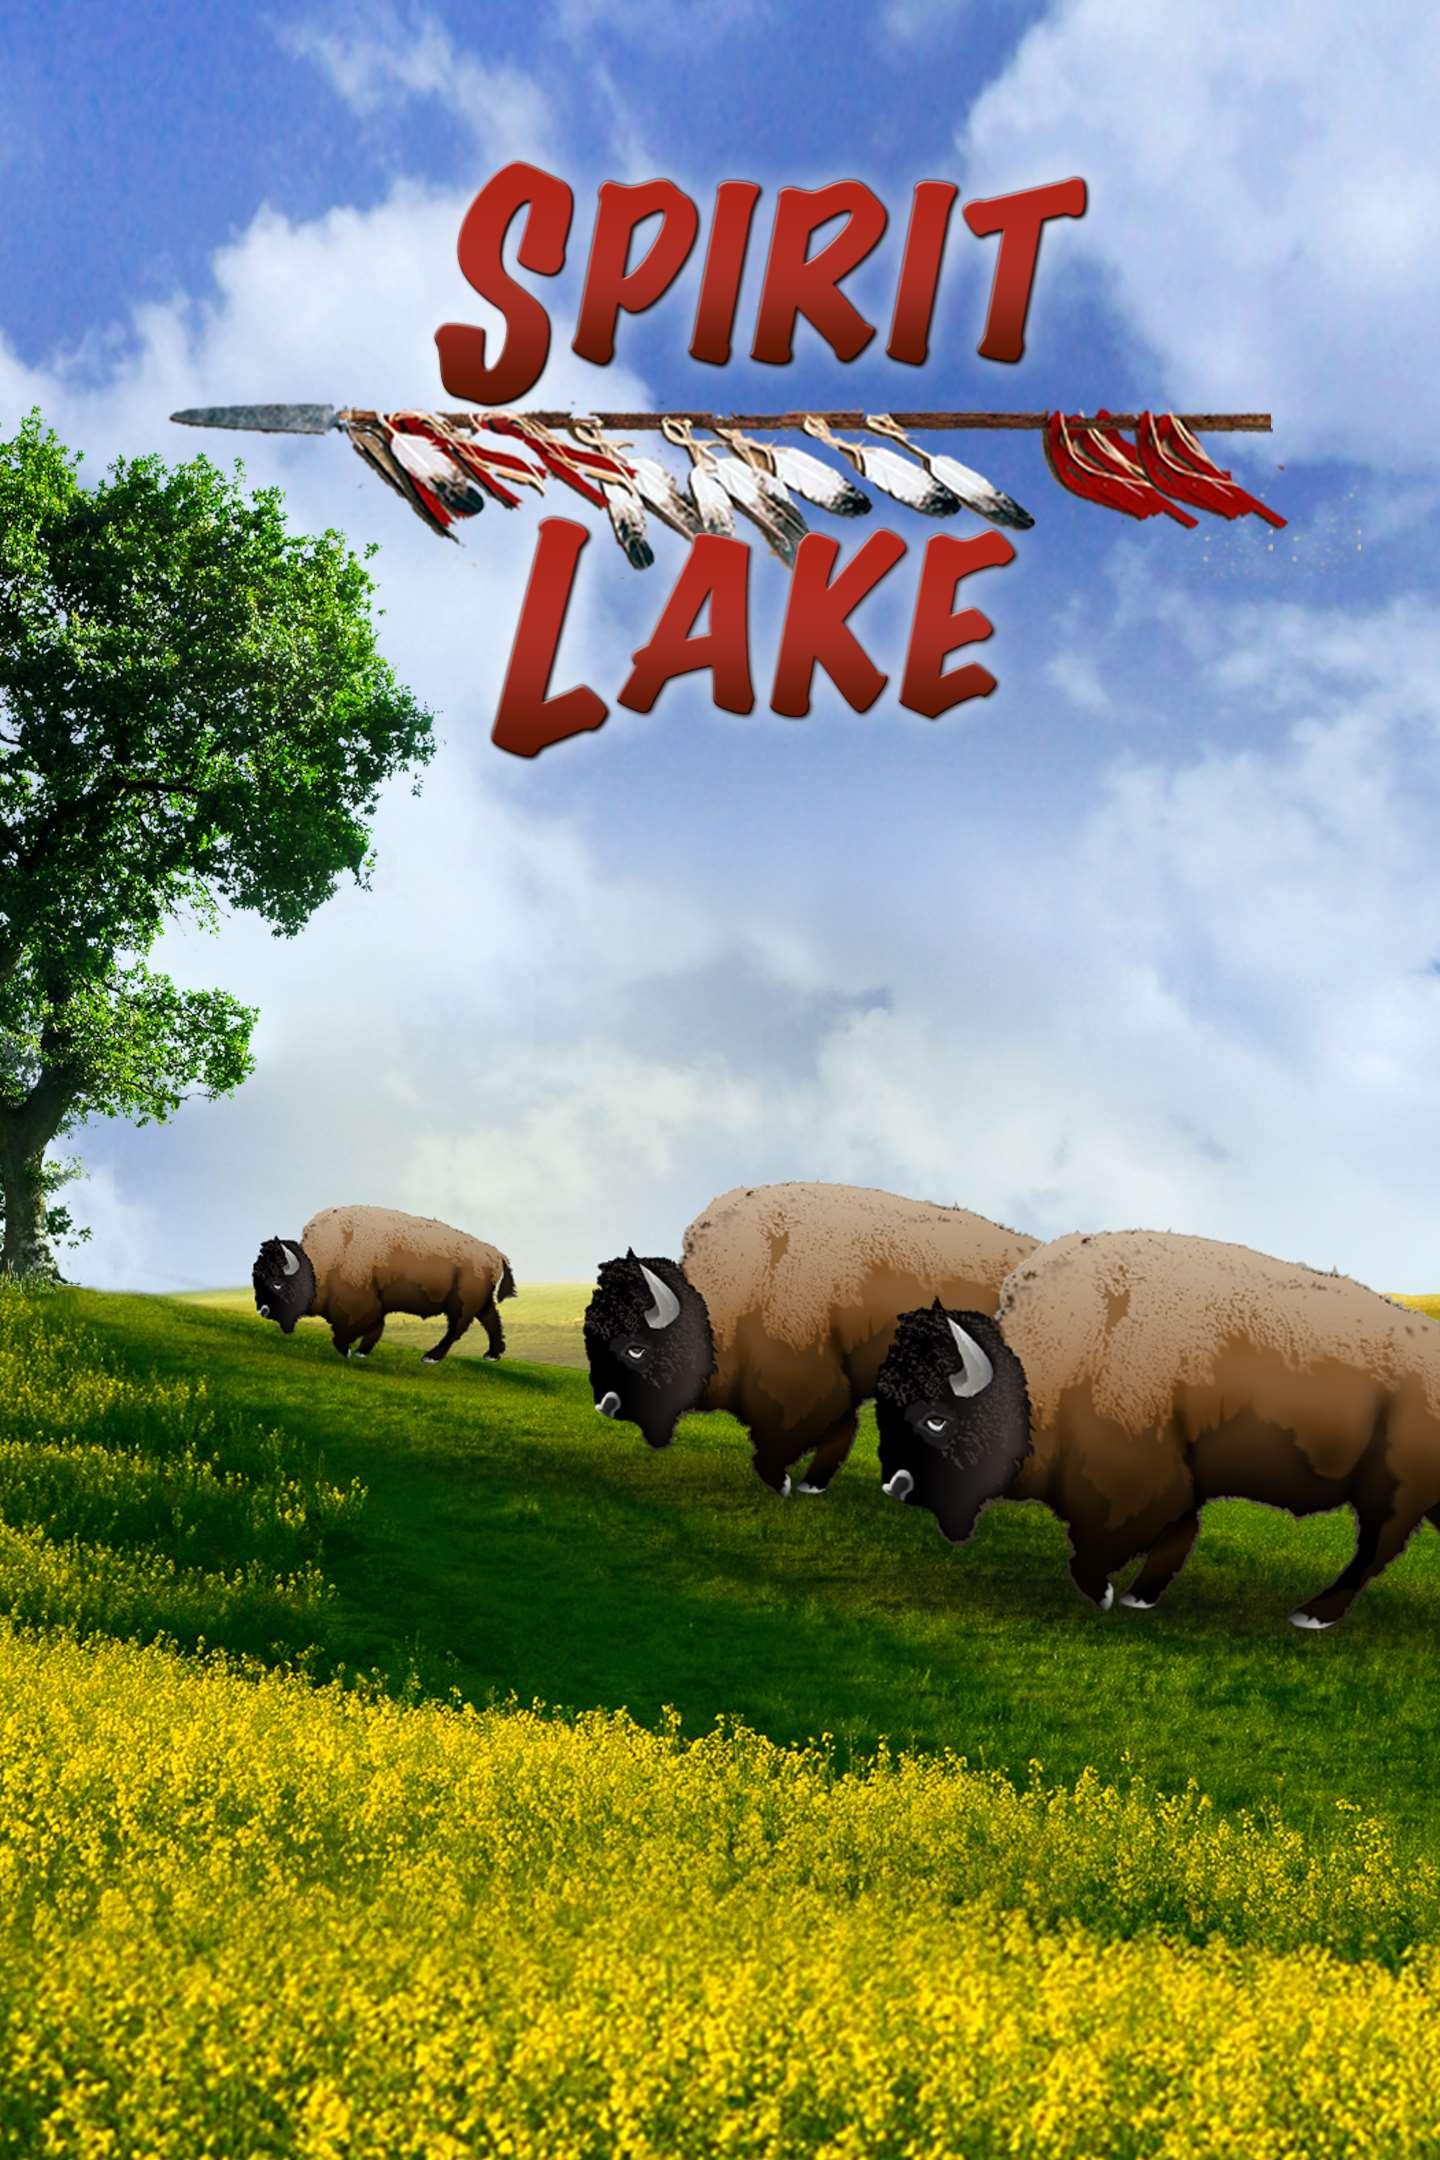 Find the best laptops for Spirit Lake